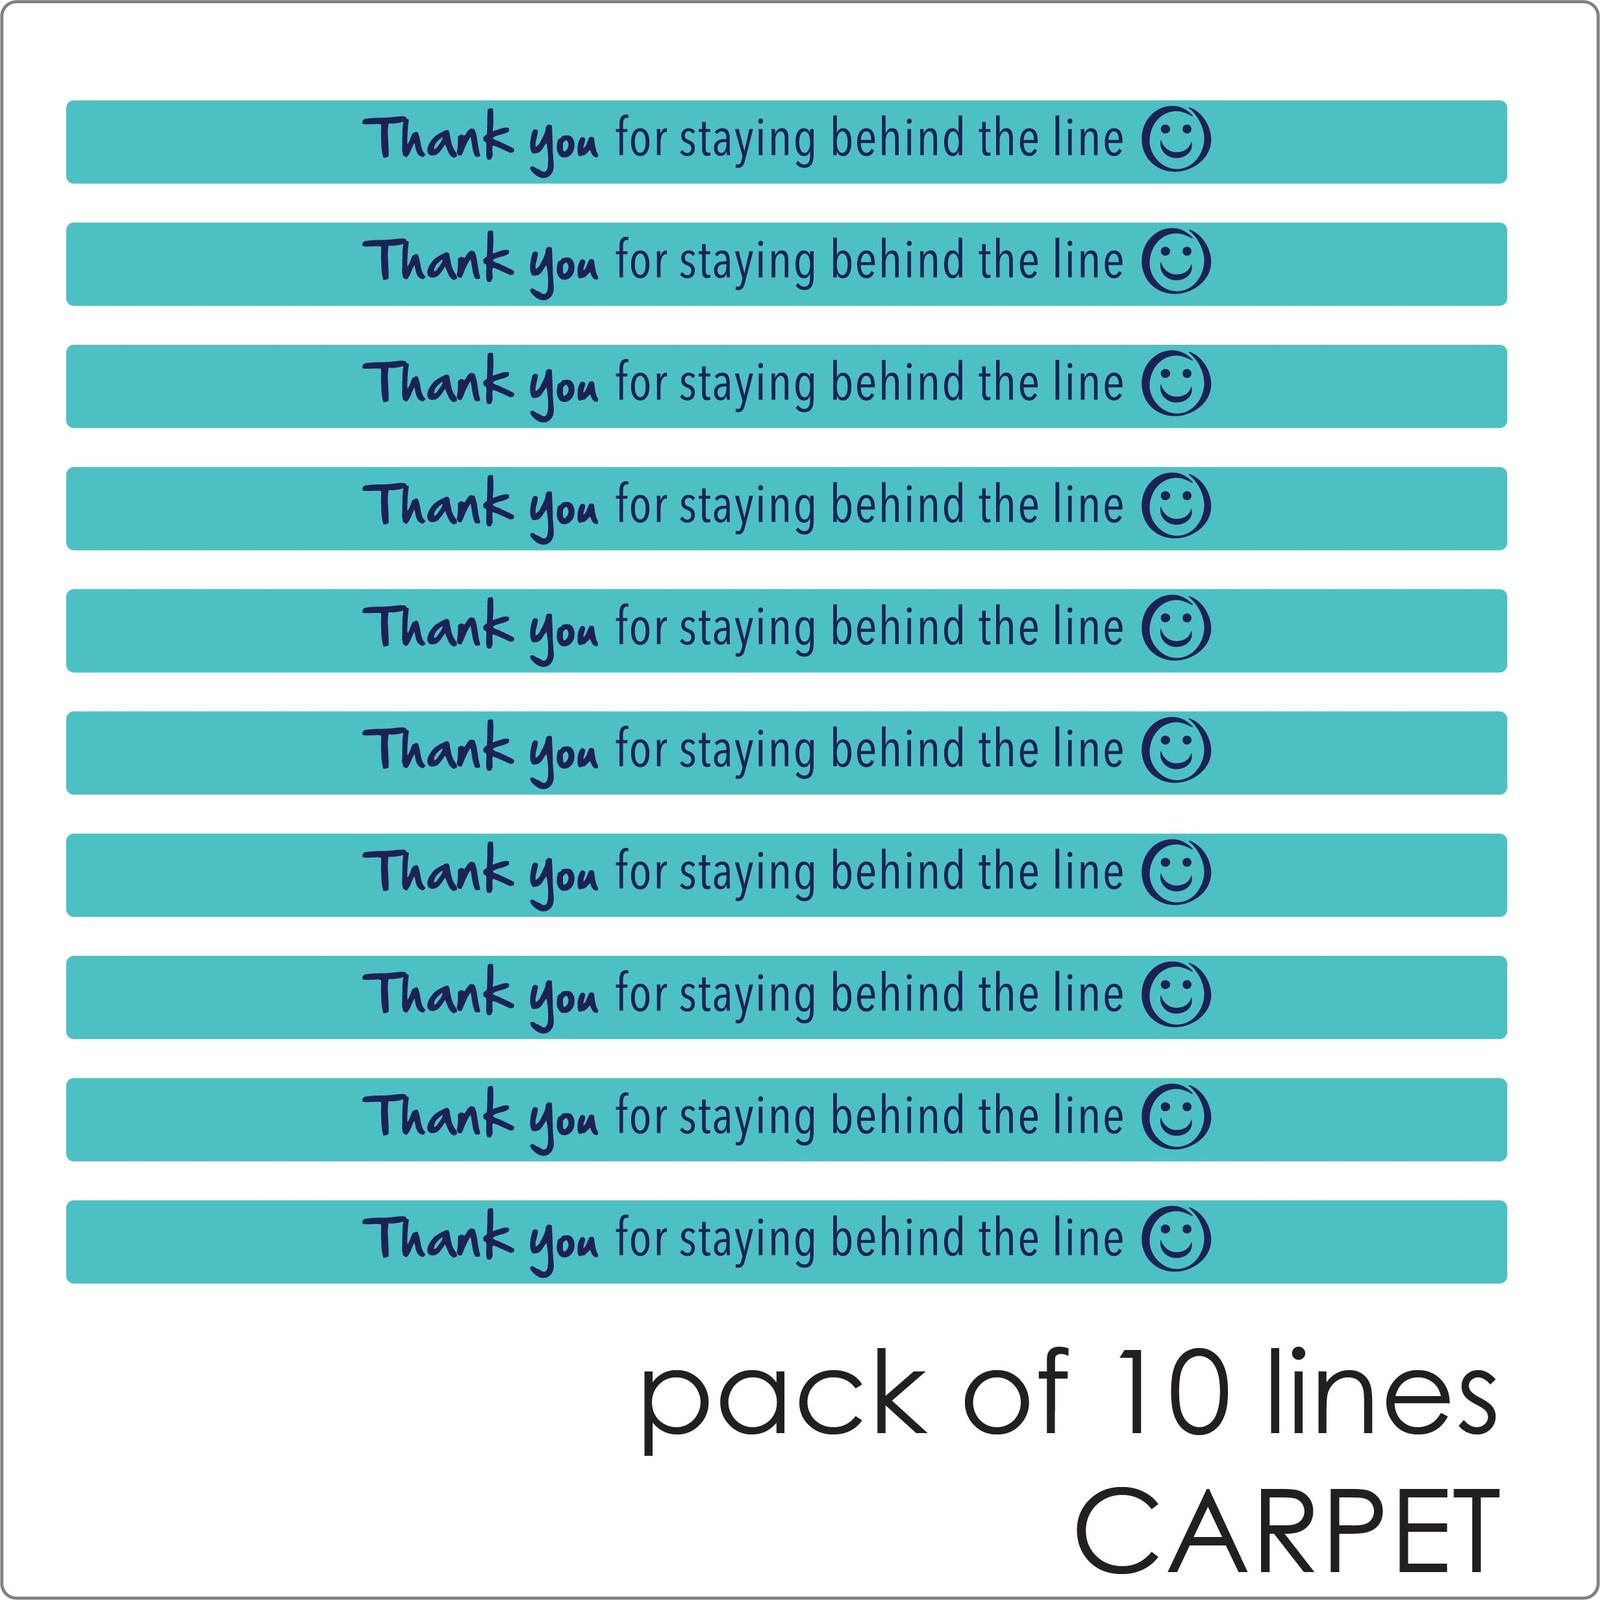 social distancing floor sticker for carpet, 10 lines, teal Self-adhesive Corona virus floor sticker to help social distancing.